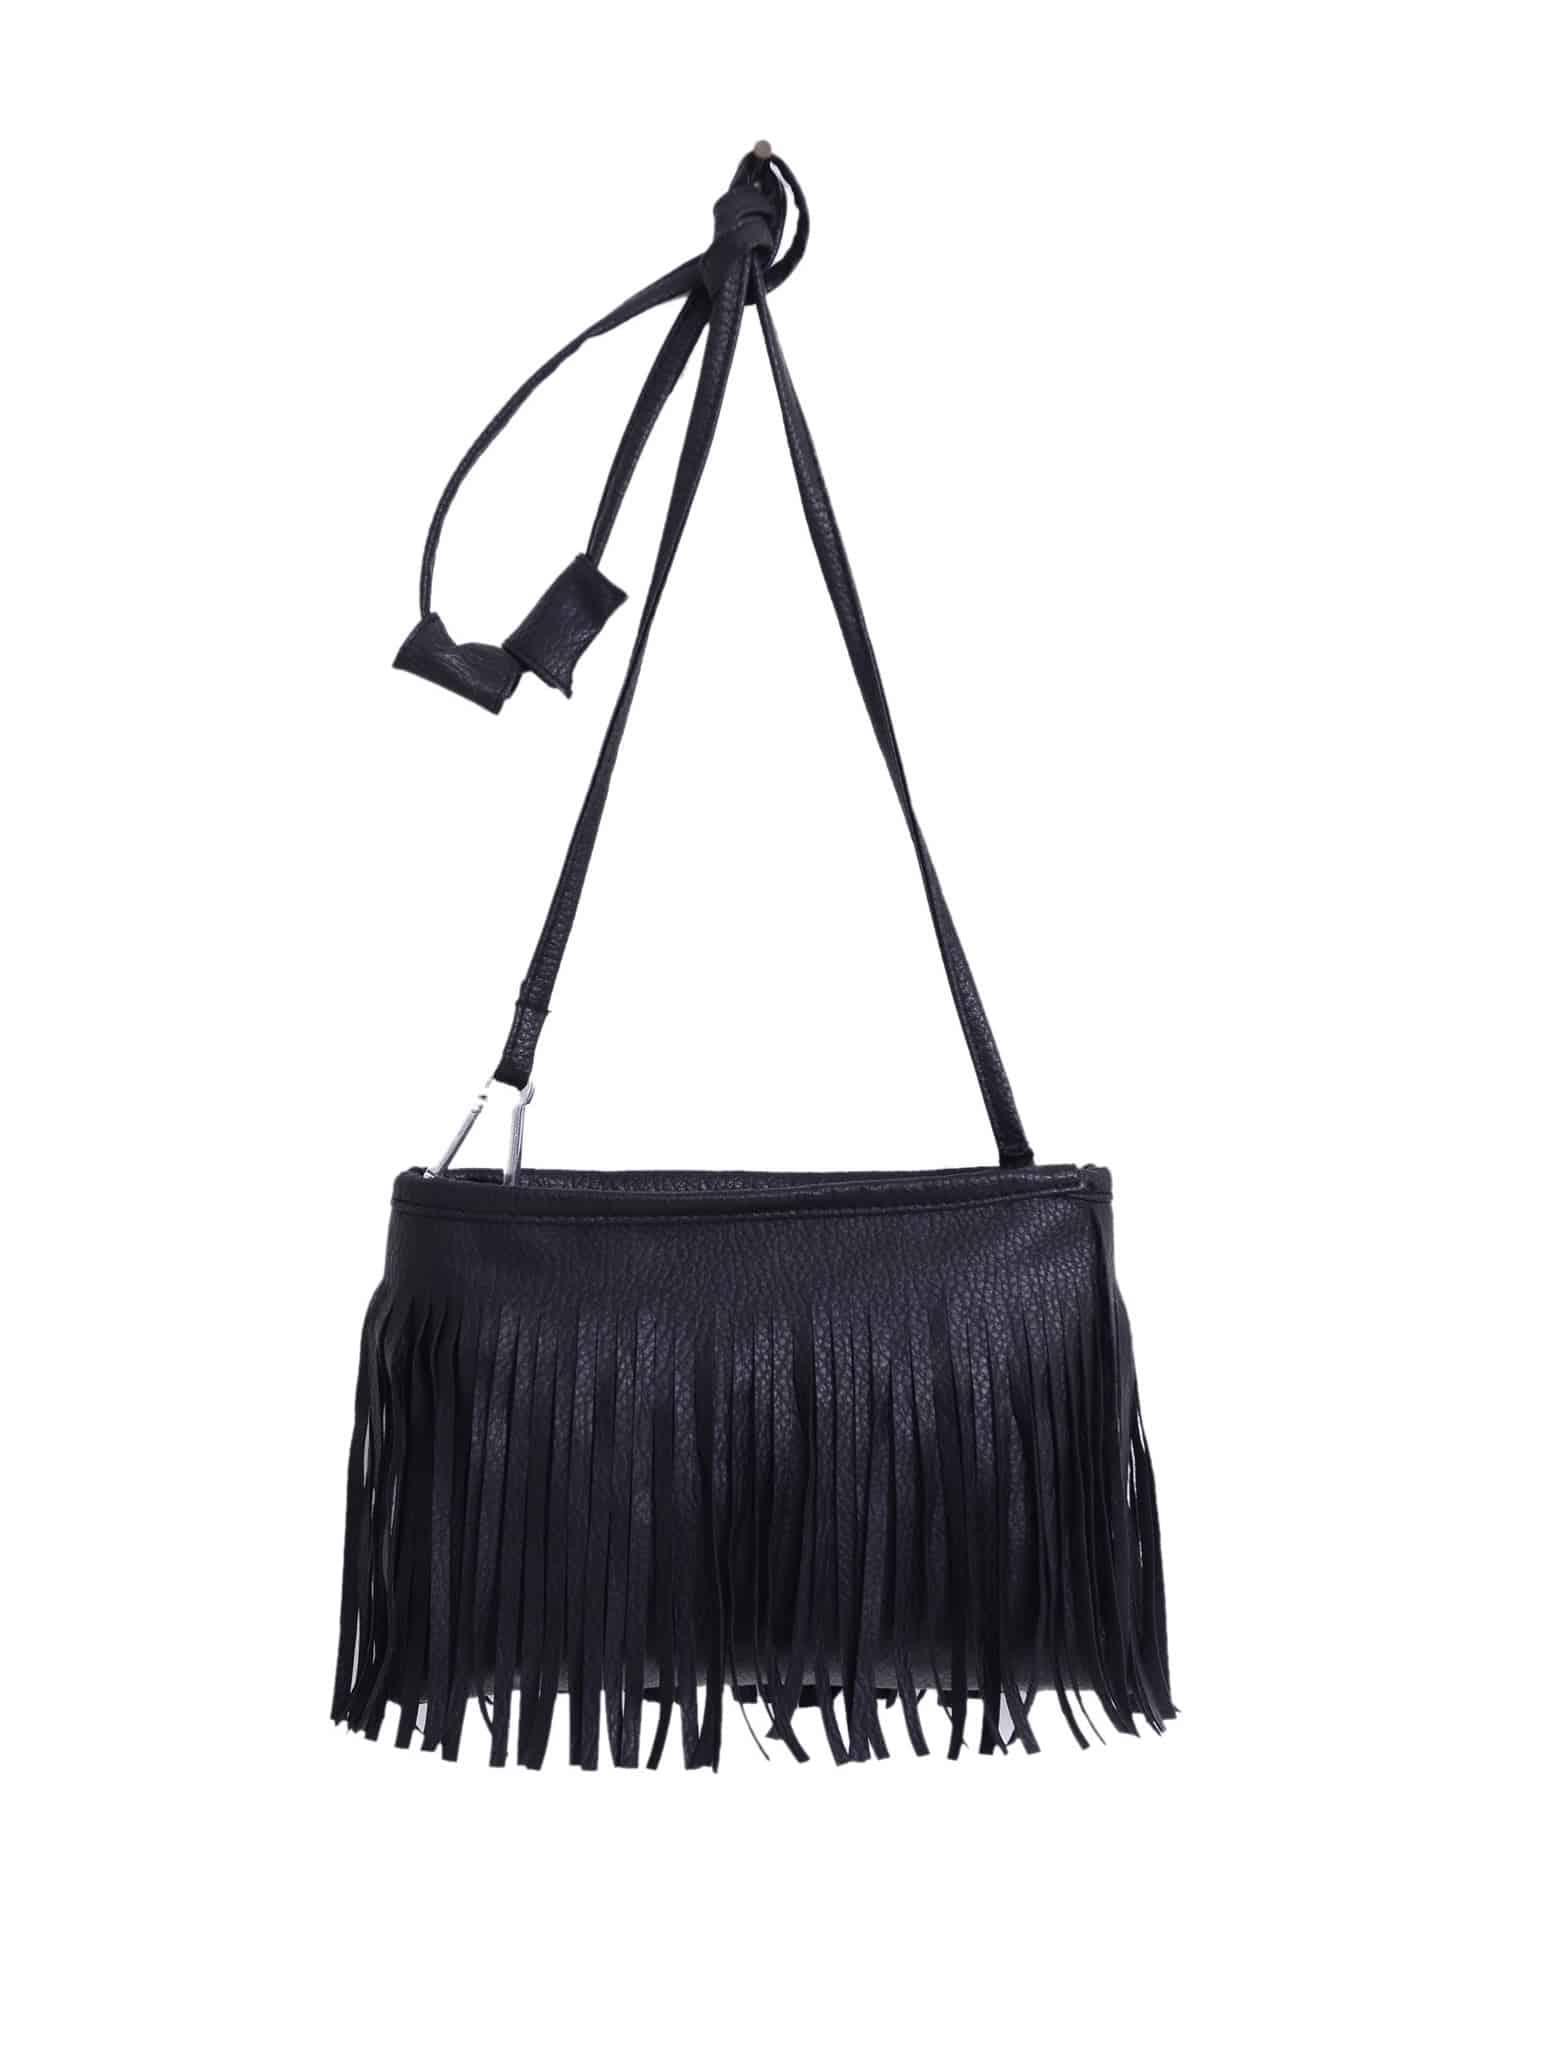 Faux Leather Tassel Crossbody Bag – Black